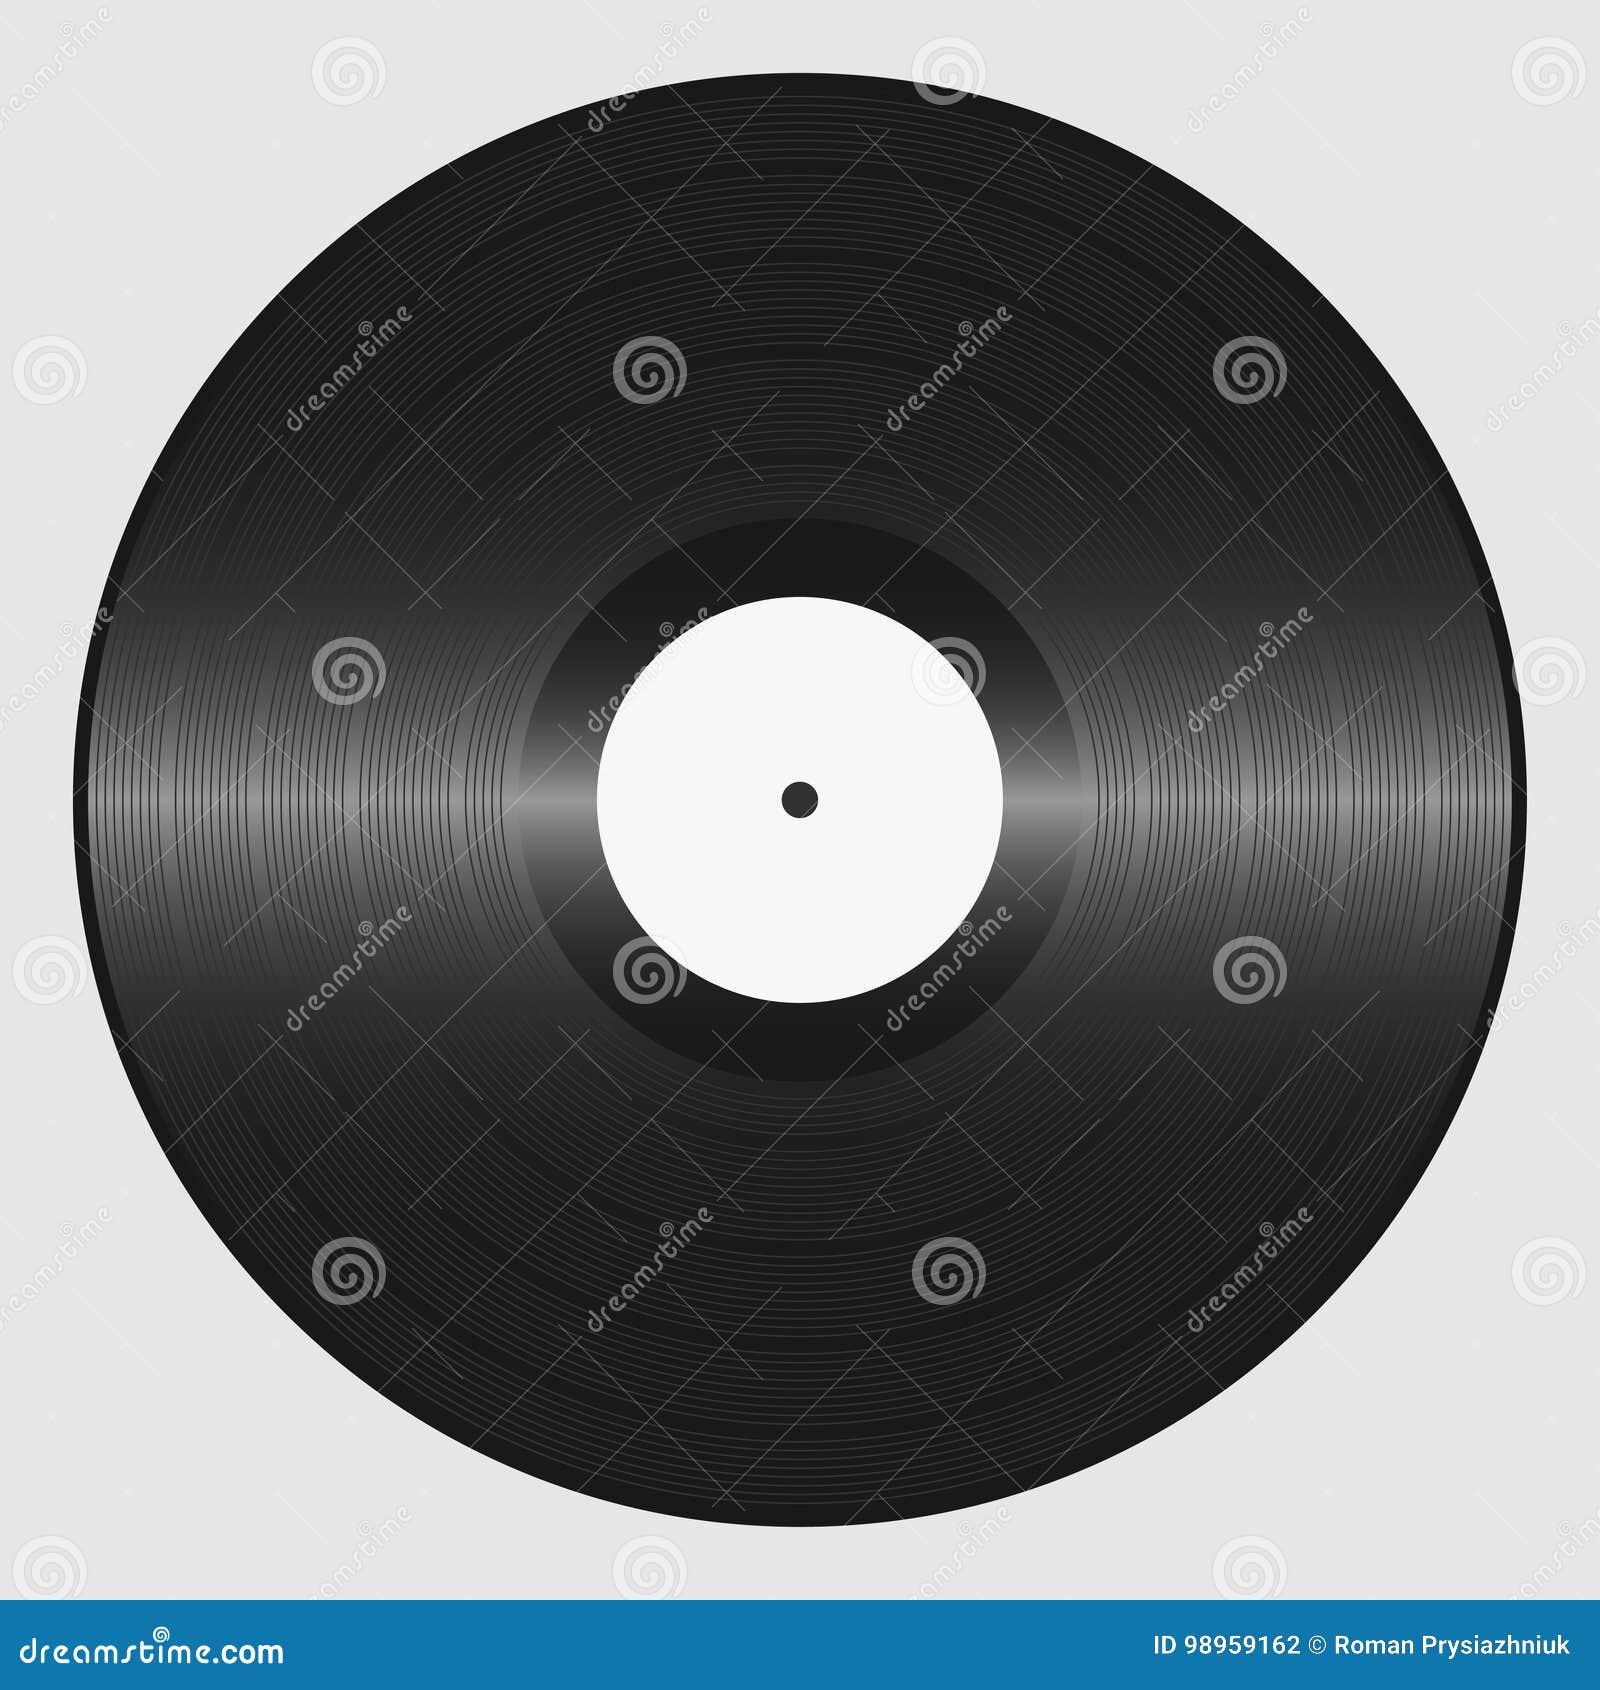 Vinyl record. Retro sound carrier. Plate for DJ Scratch.